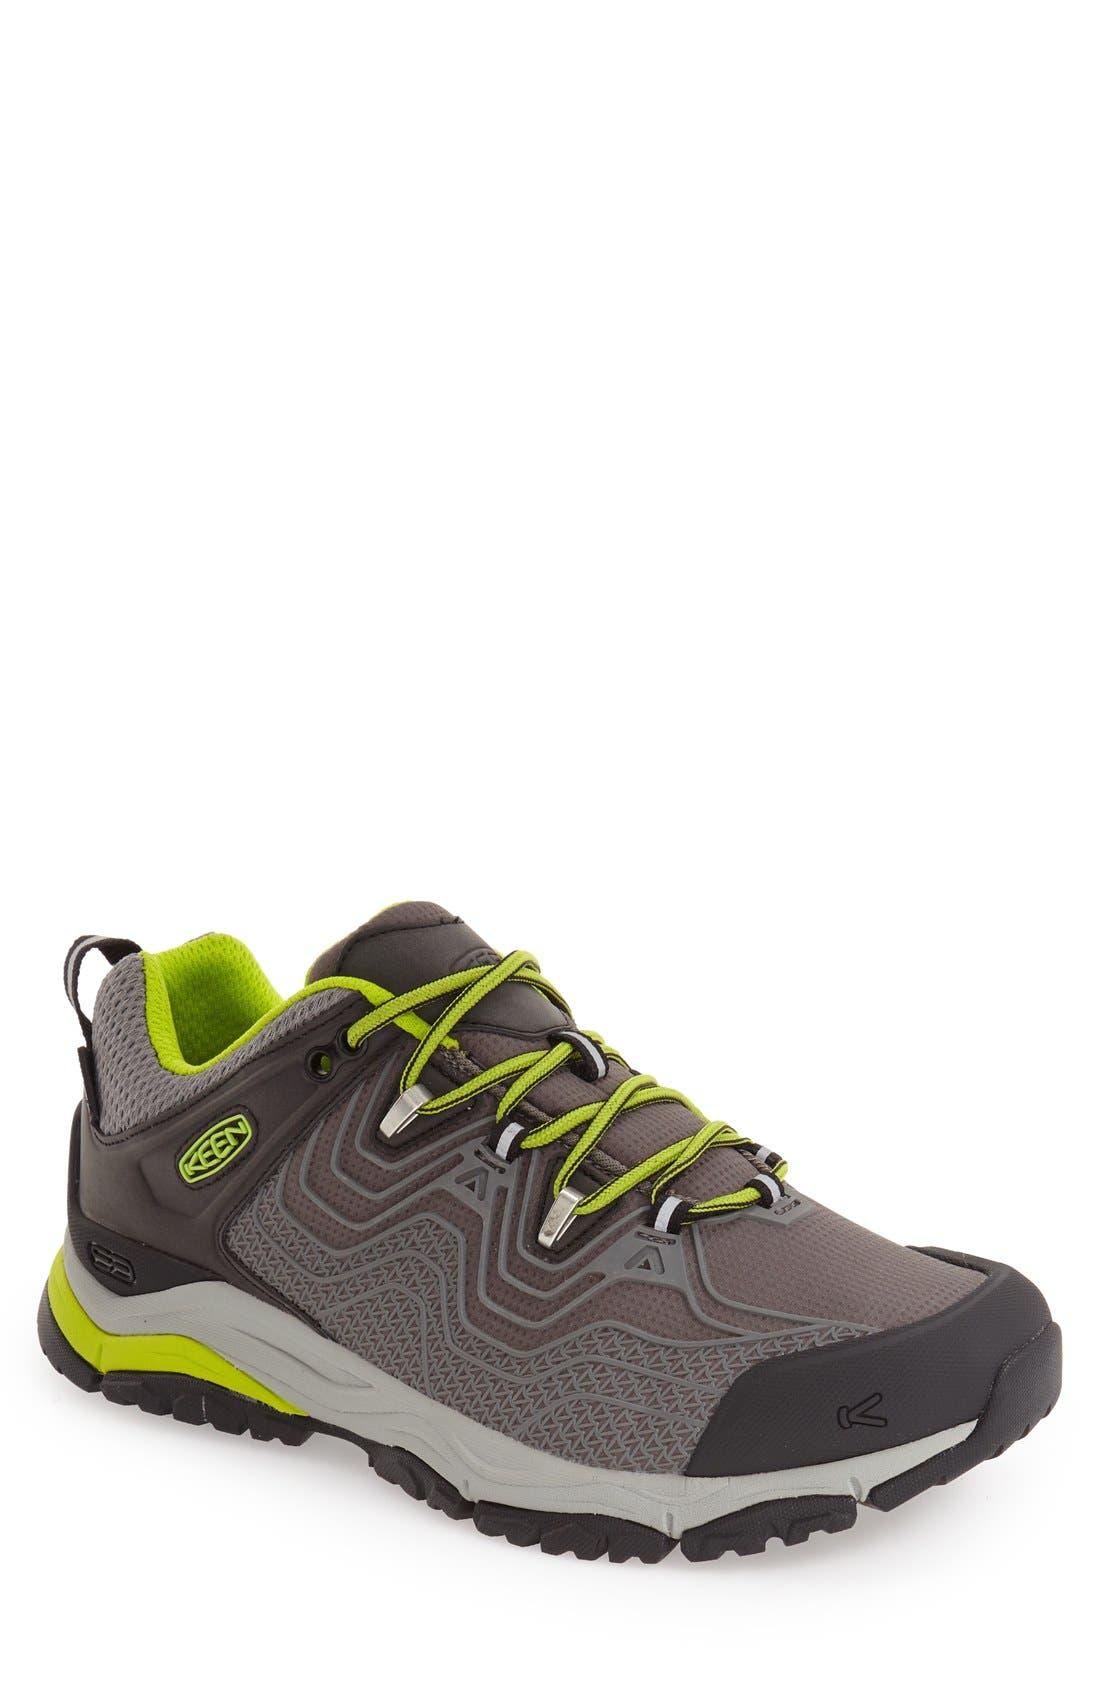 Alternate Image 1 Selected - Keen 'Aphlex' Waterproof Low Profile Hiking Shoe (Men)